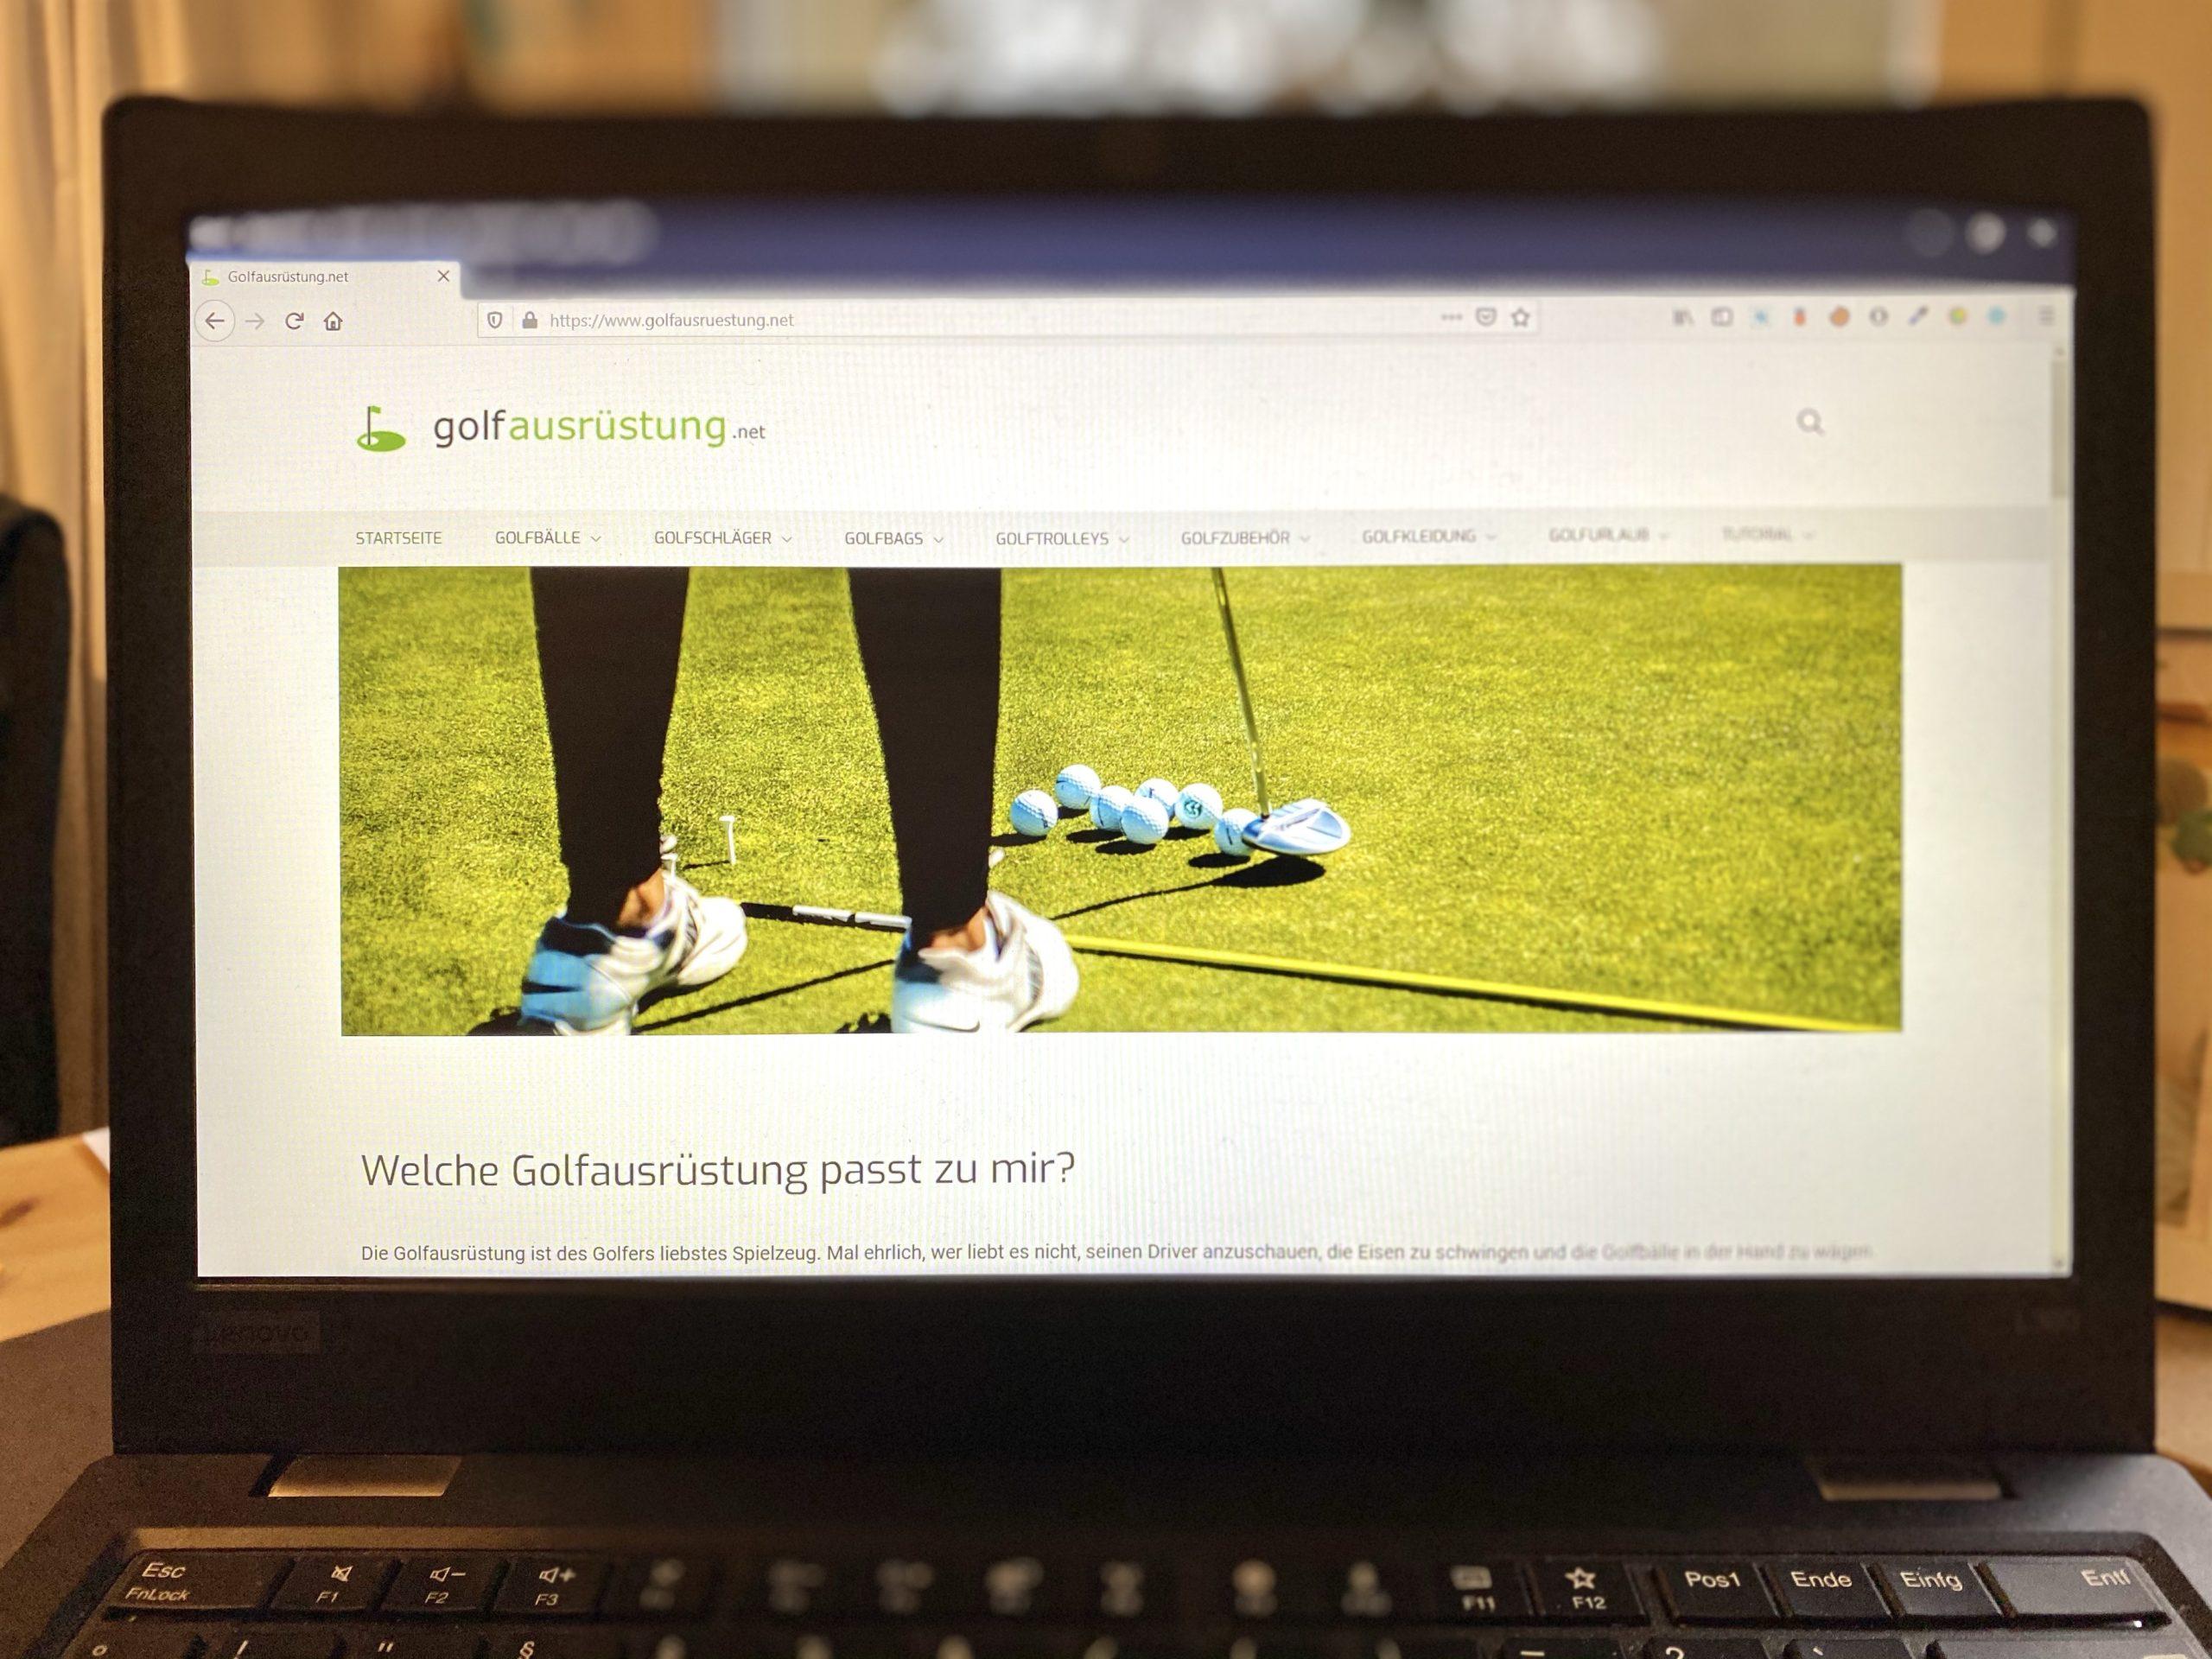 Golfausruestung.net – Affiliate Marketing, E-Commerce